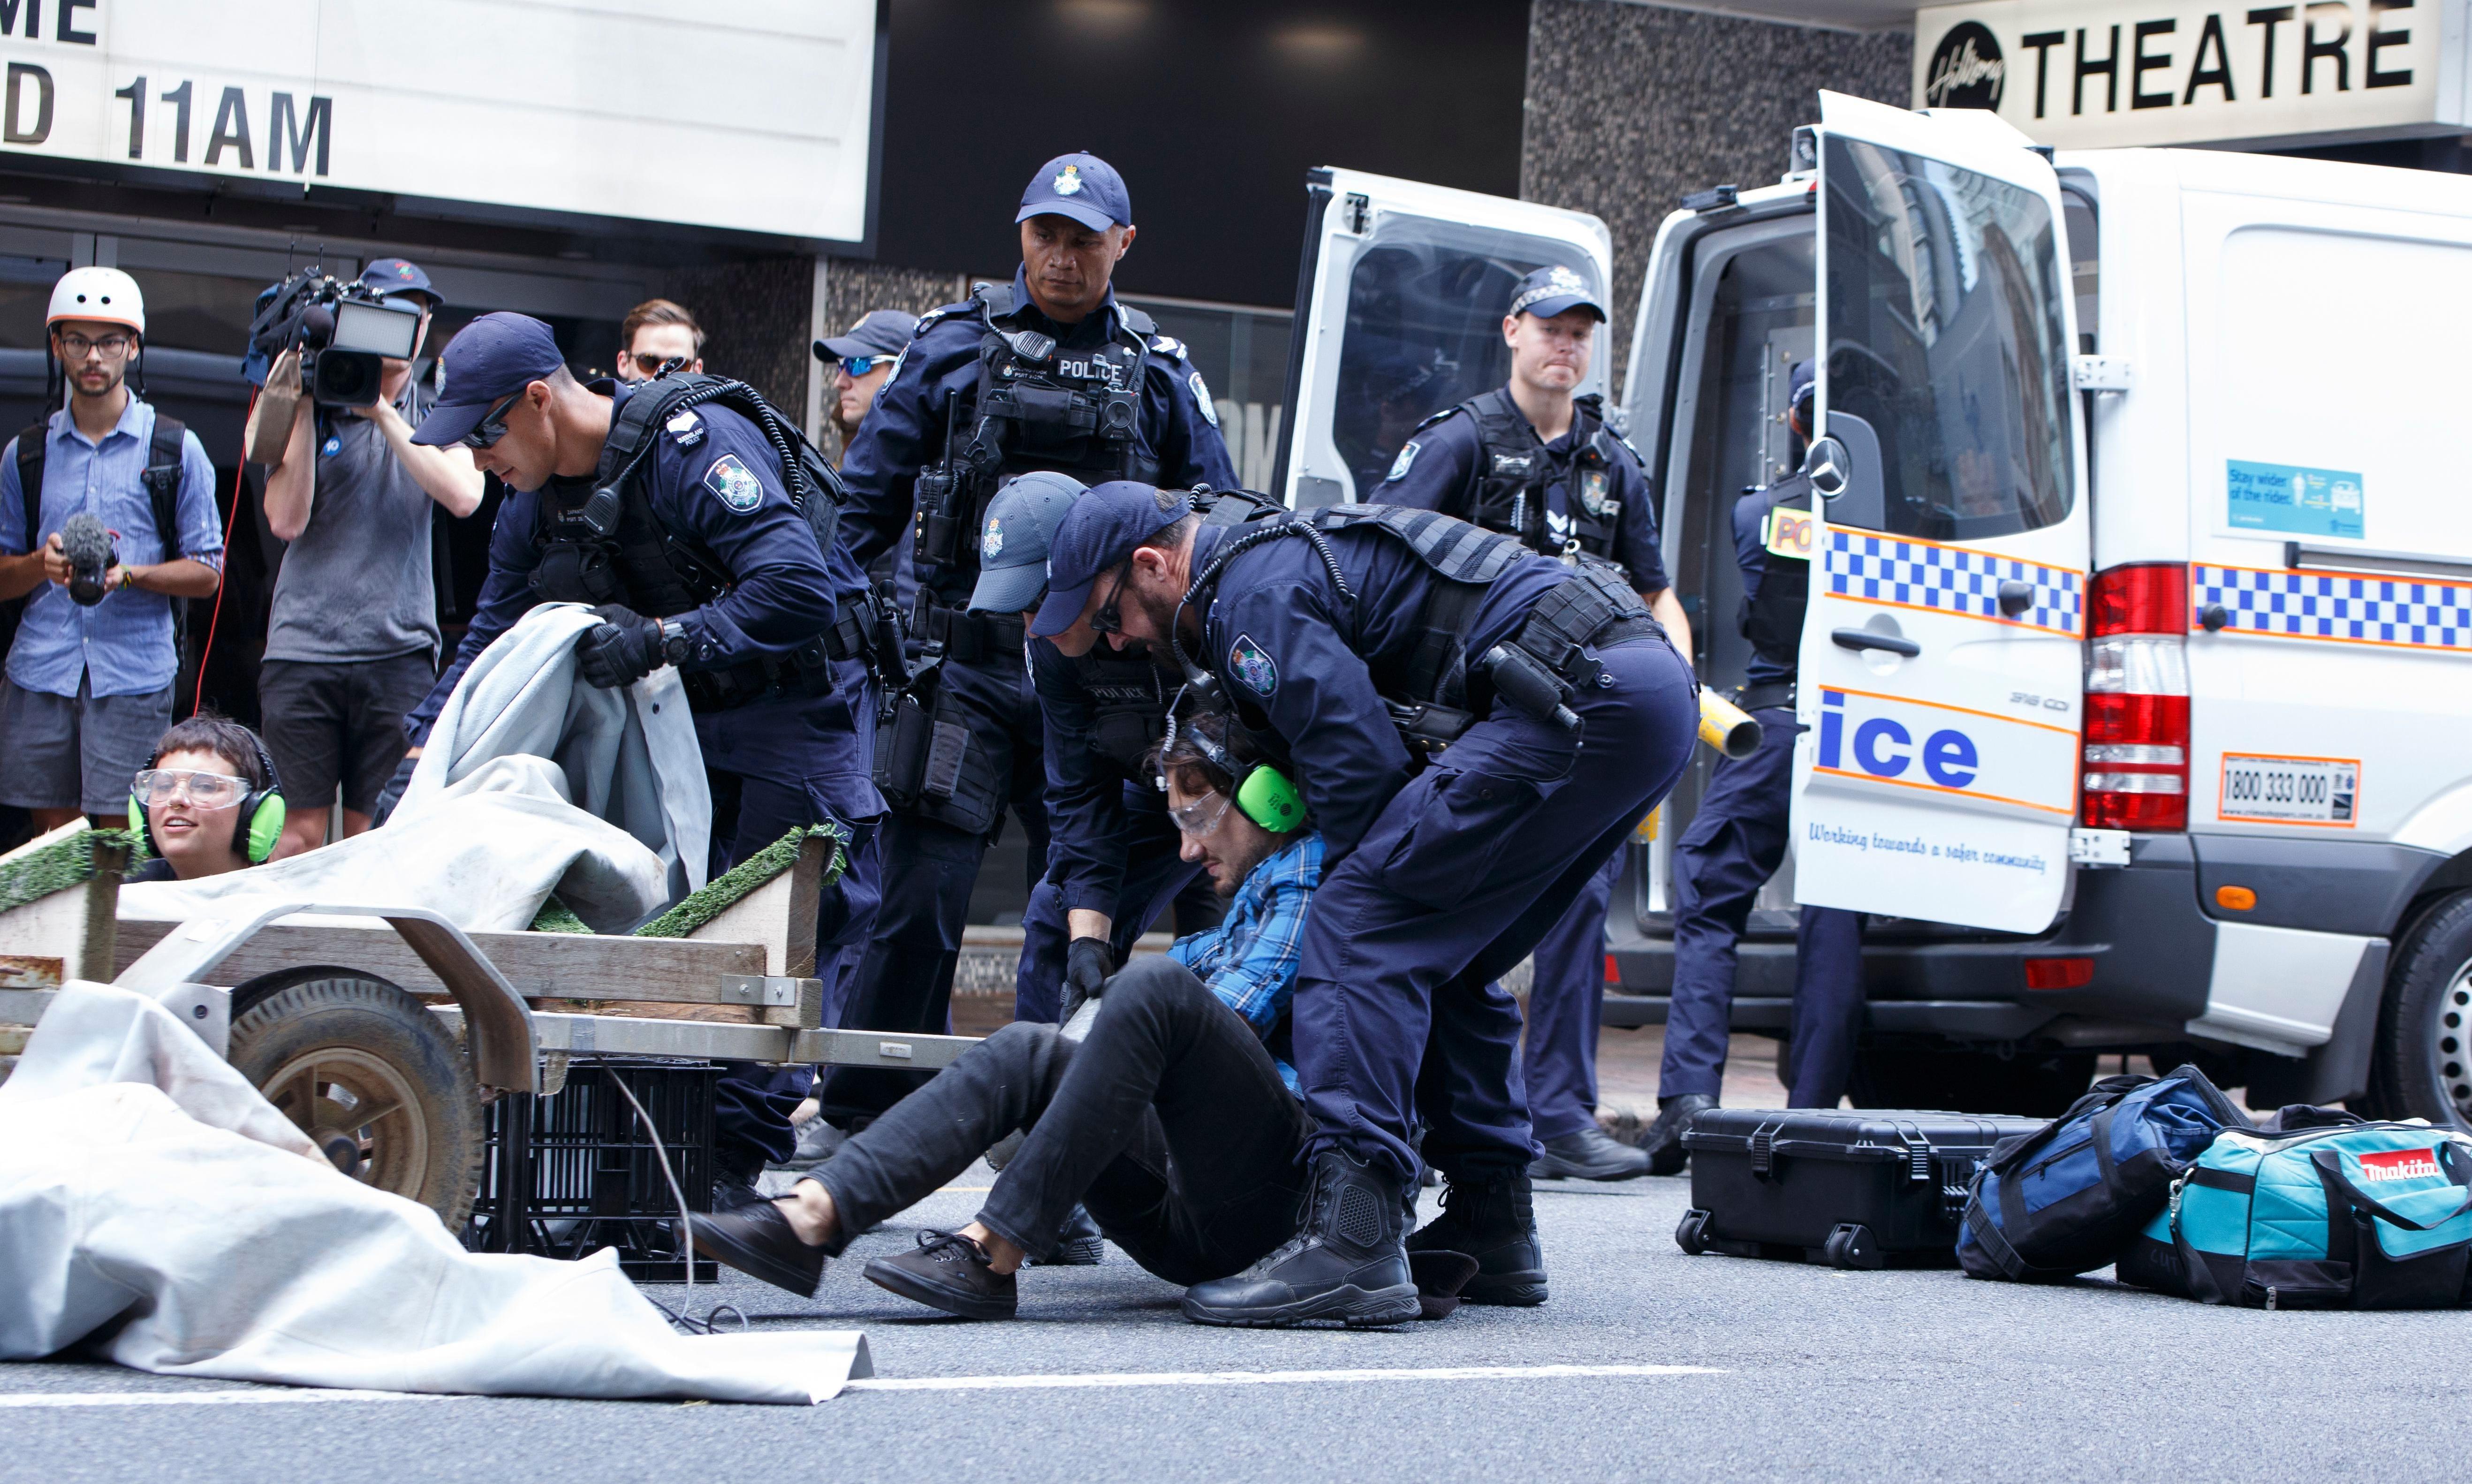 Extinction Rebellion: Labor members say 'chilling' mass arrests have echoes of Bjelke-Petersen era